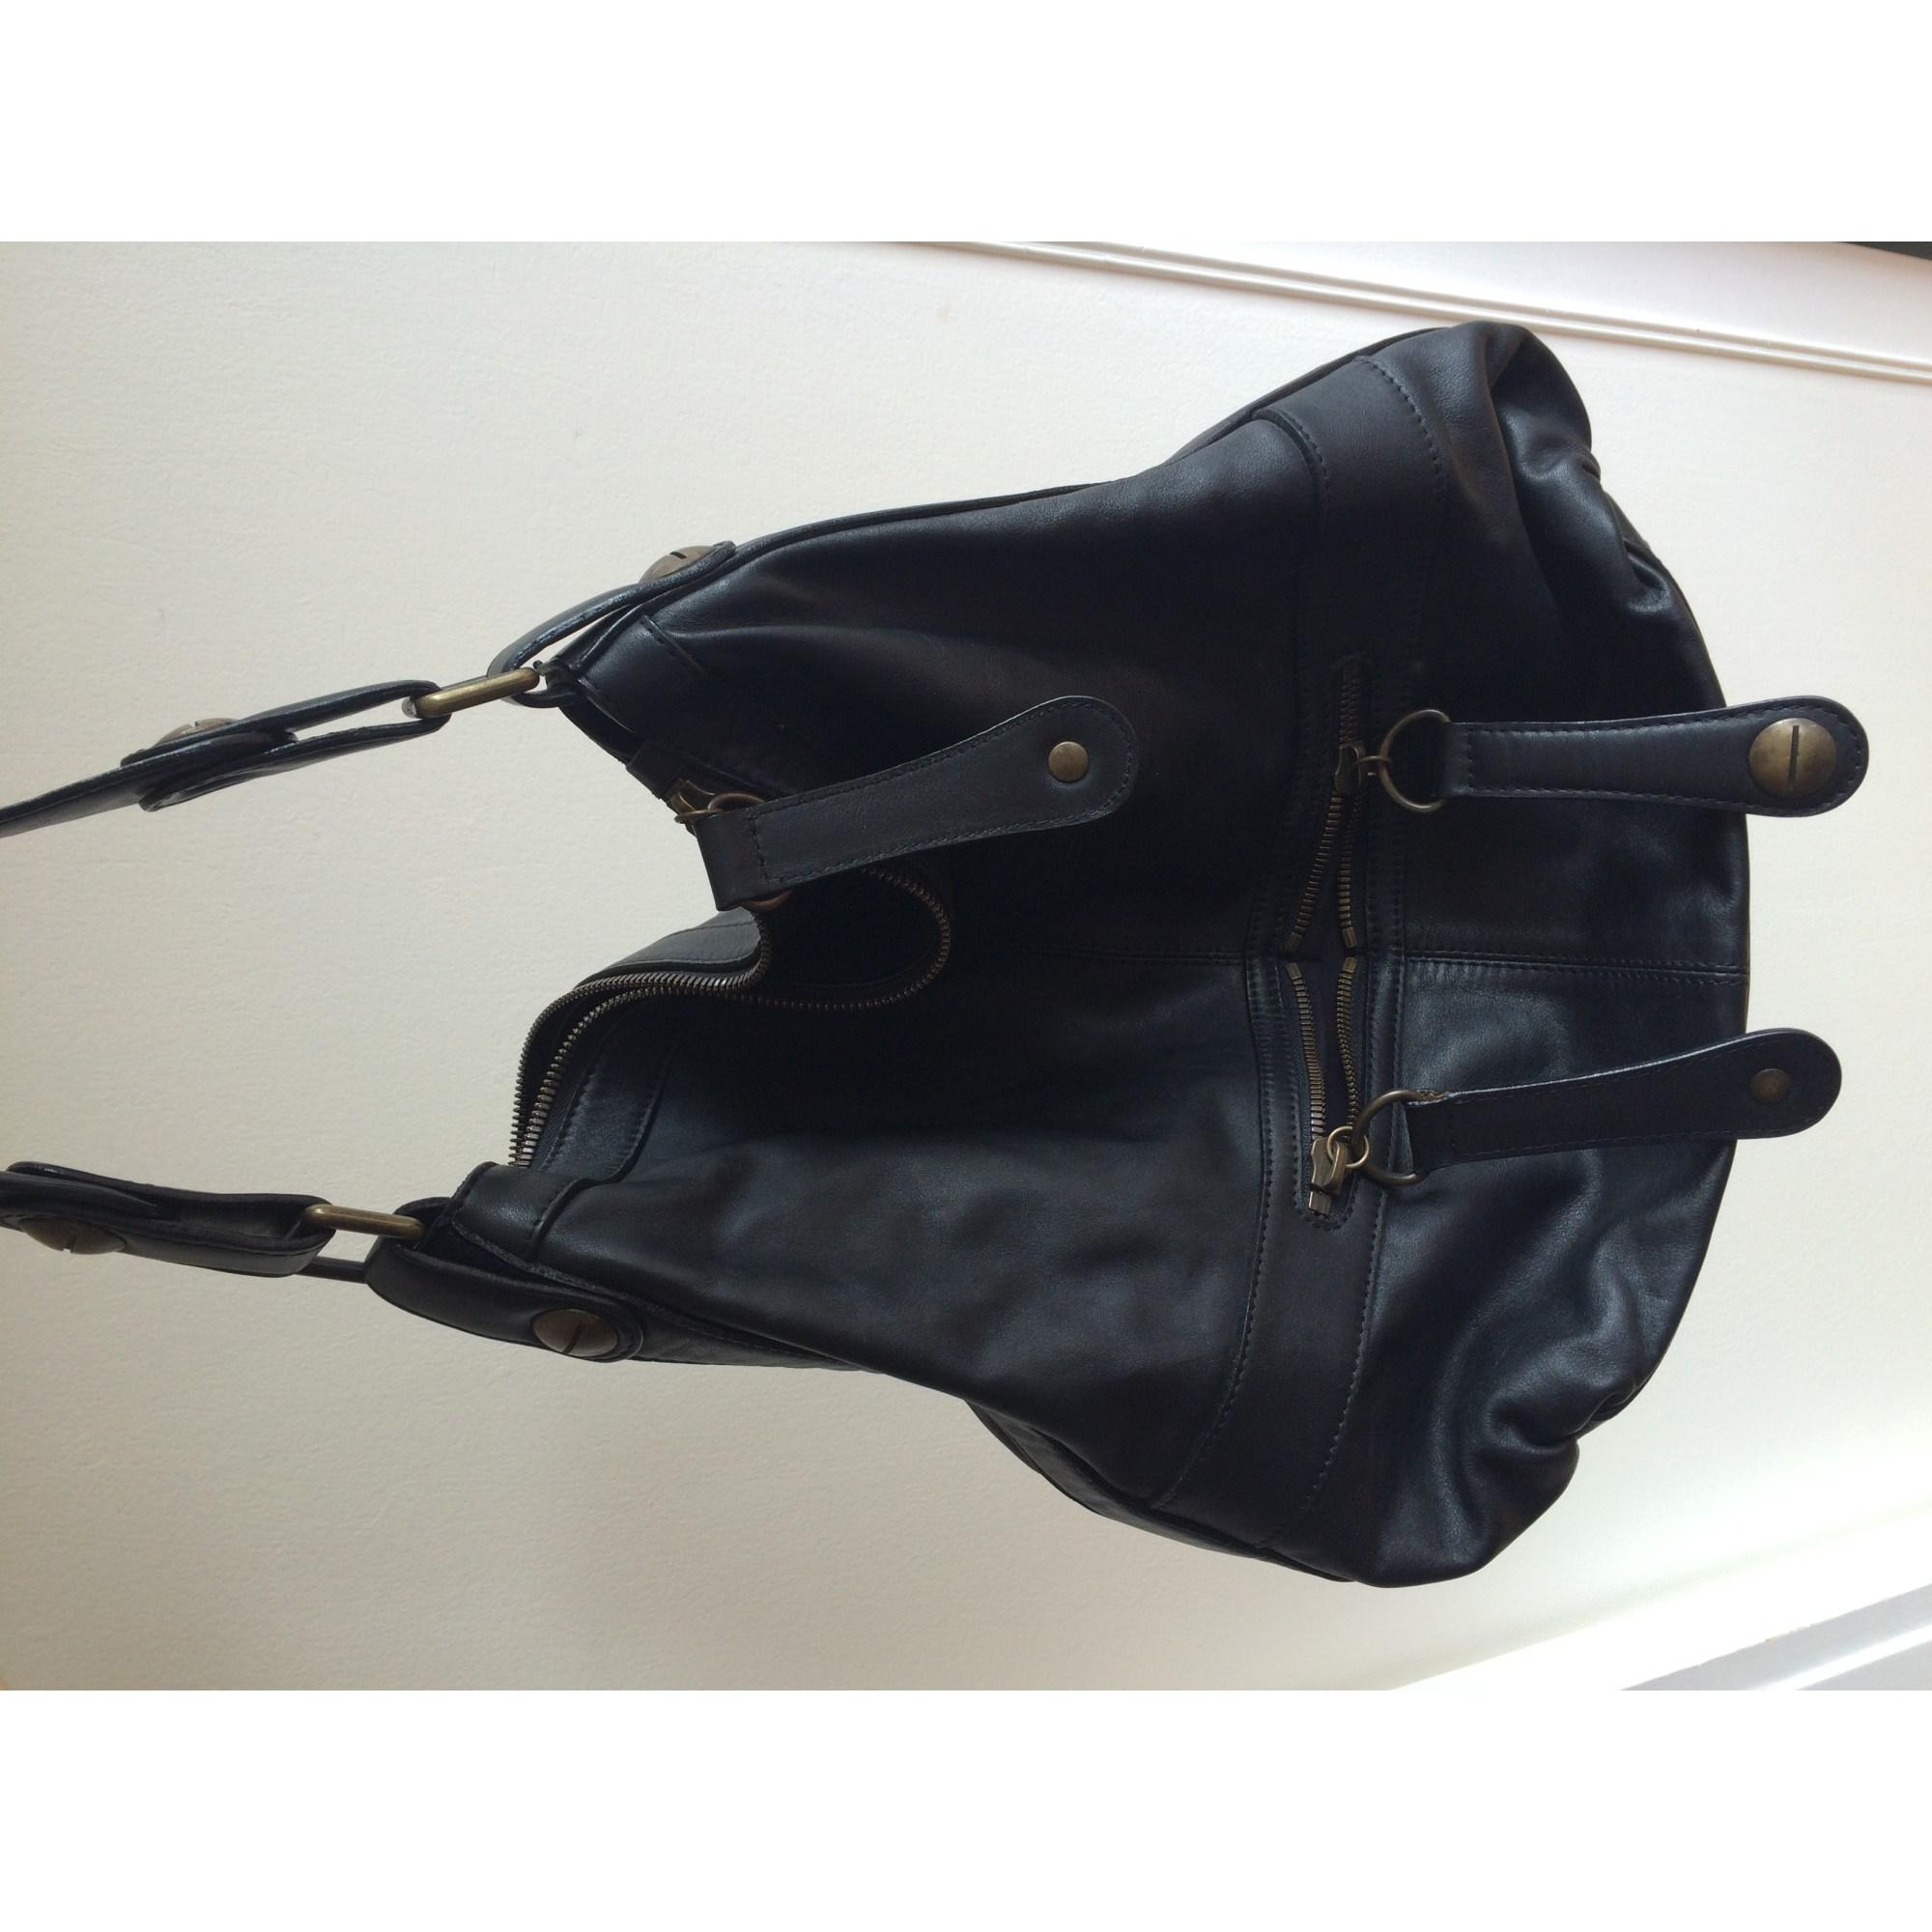 Sac à main en cuir GERARD DAREL noir vendu par Odette ginette - 3913430 829999feb4eb